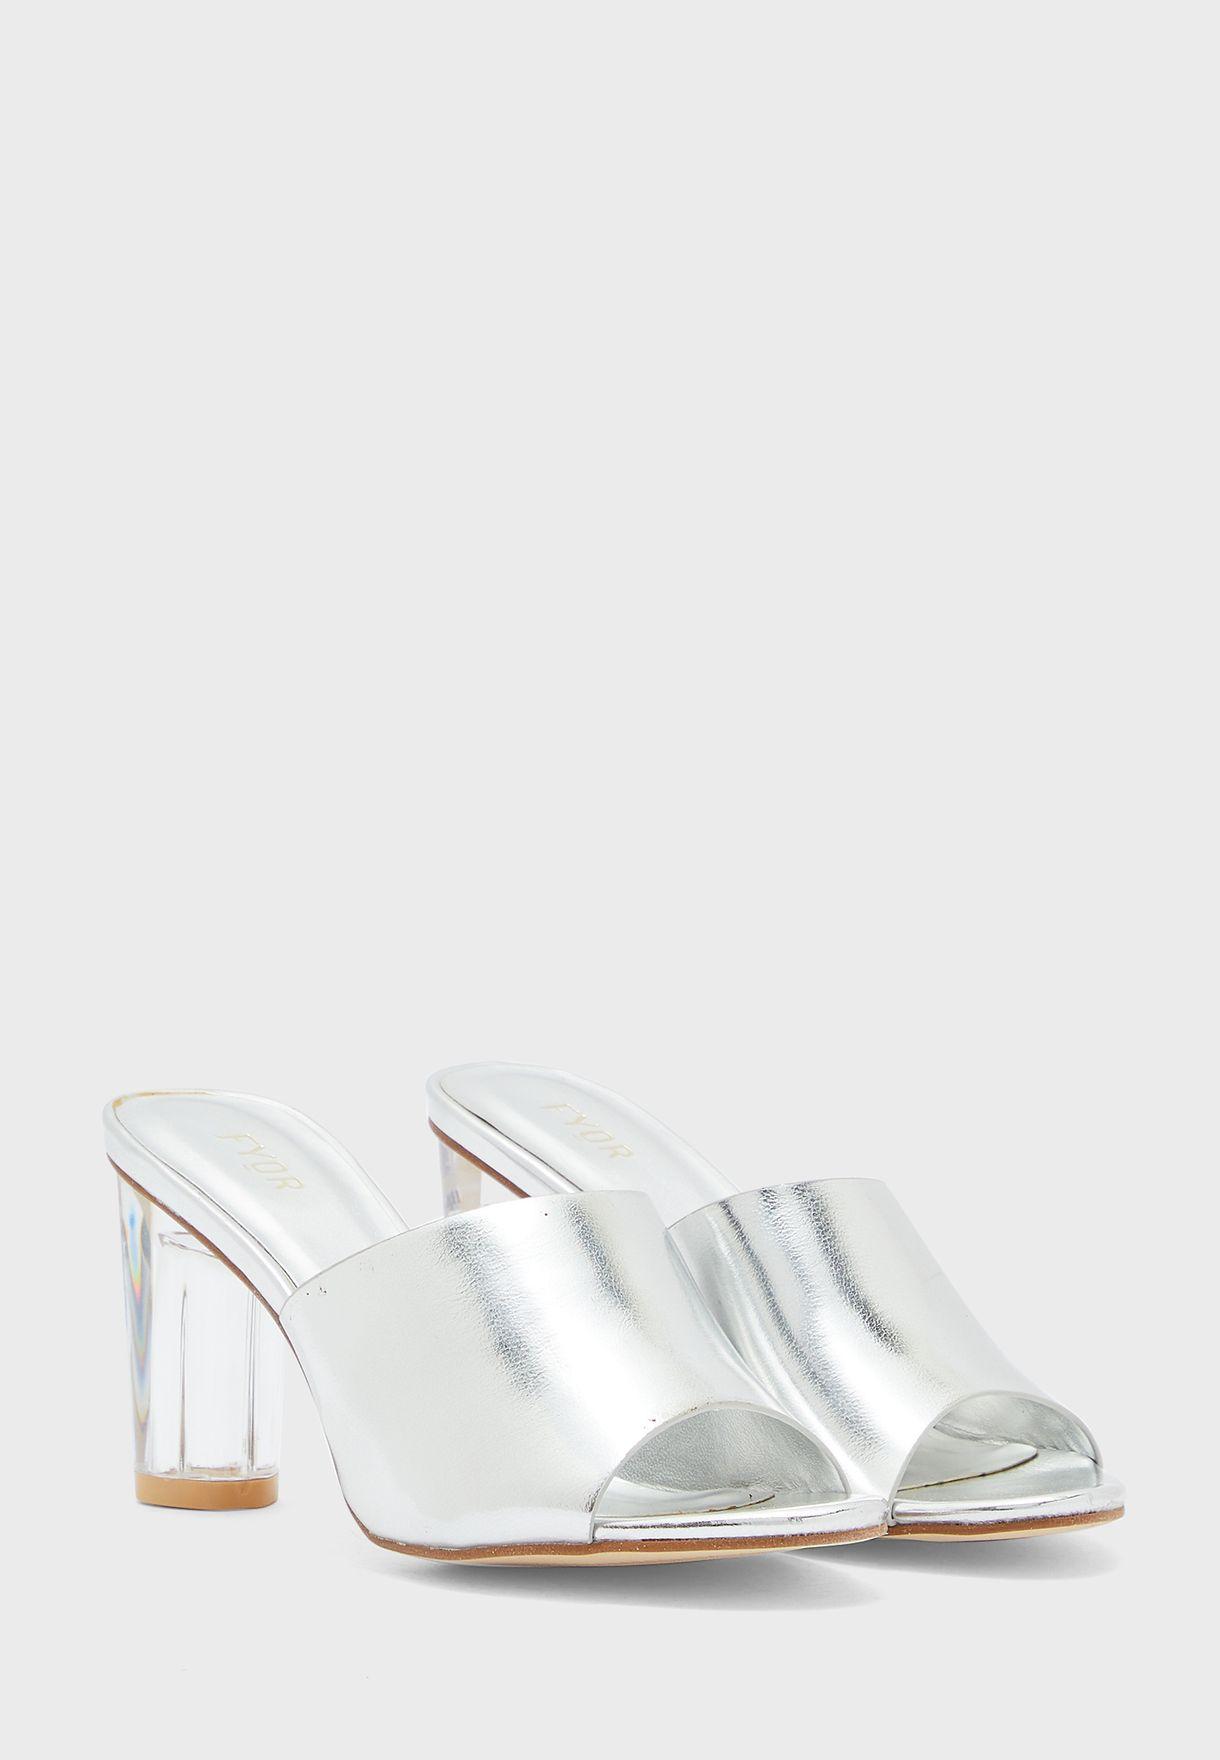 Mule Low Heel Sandals